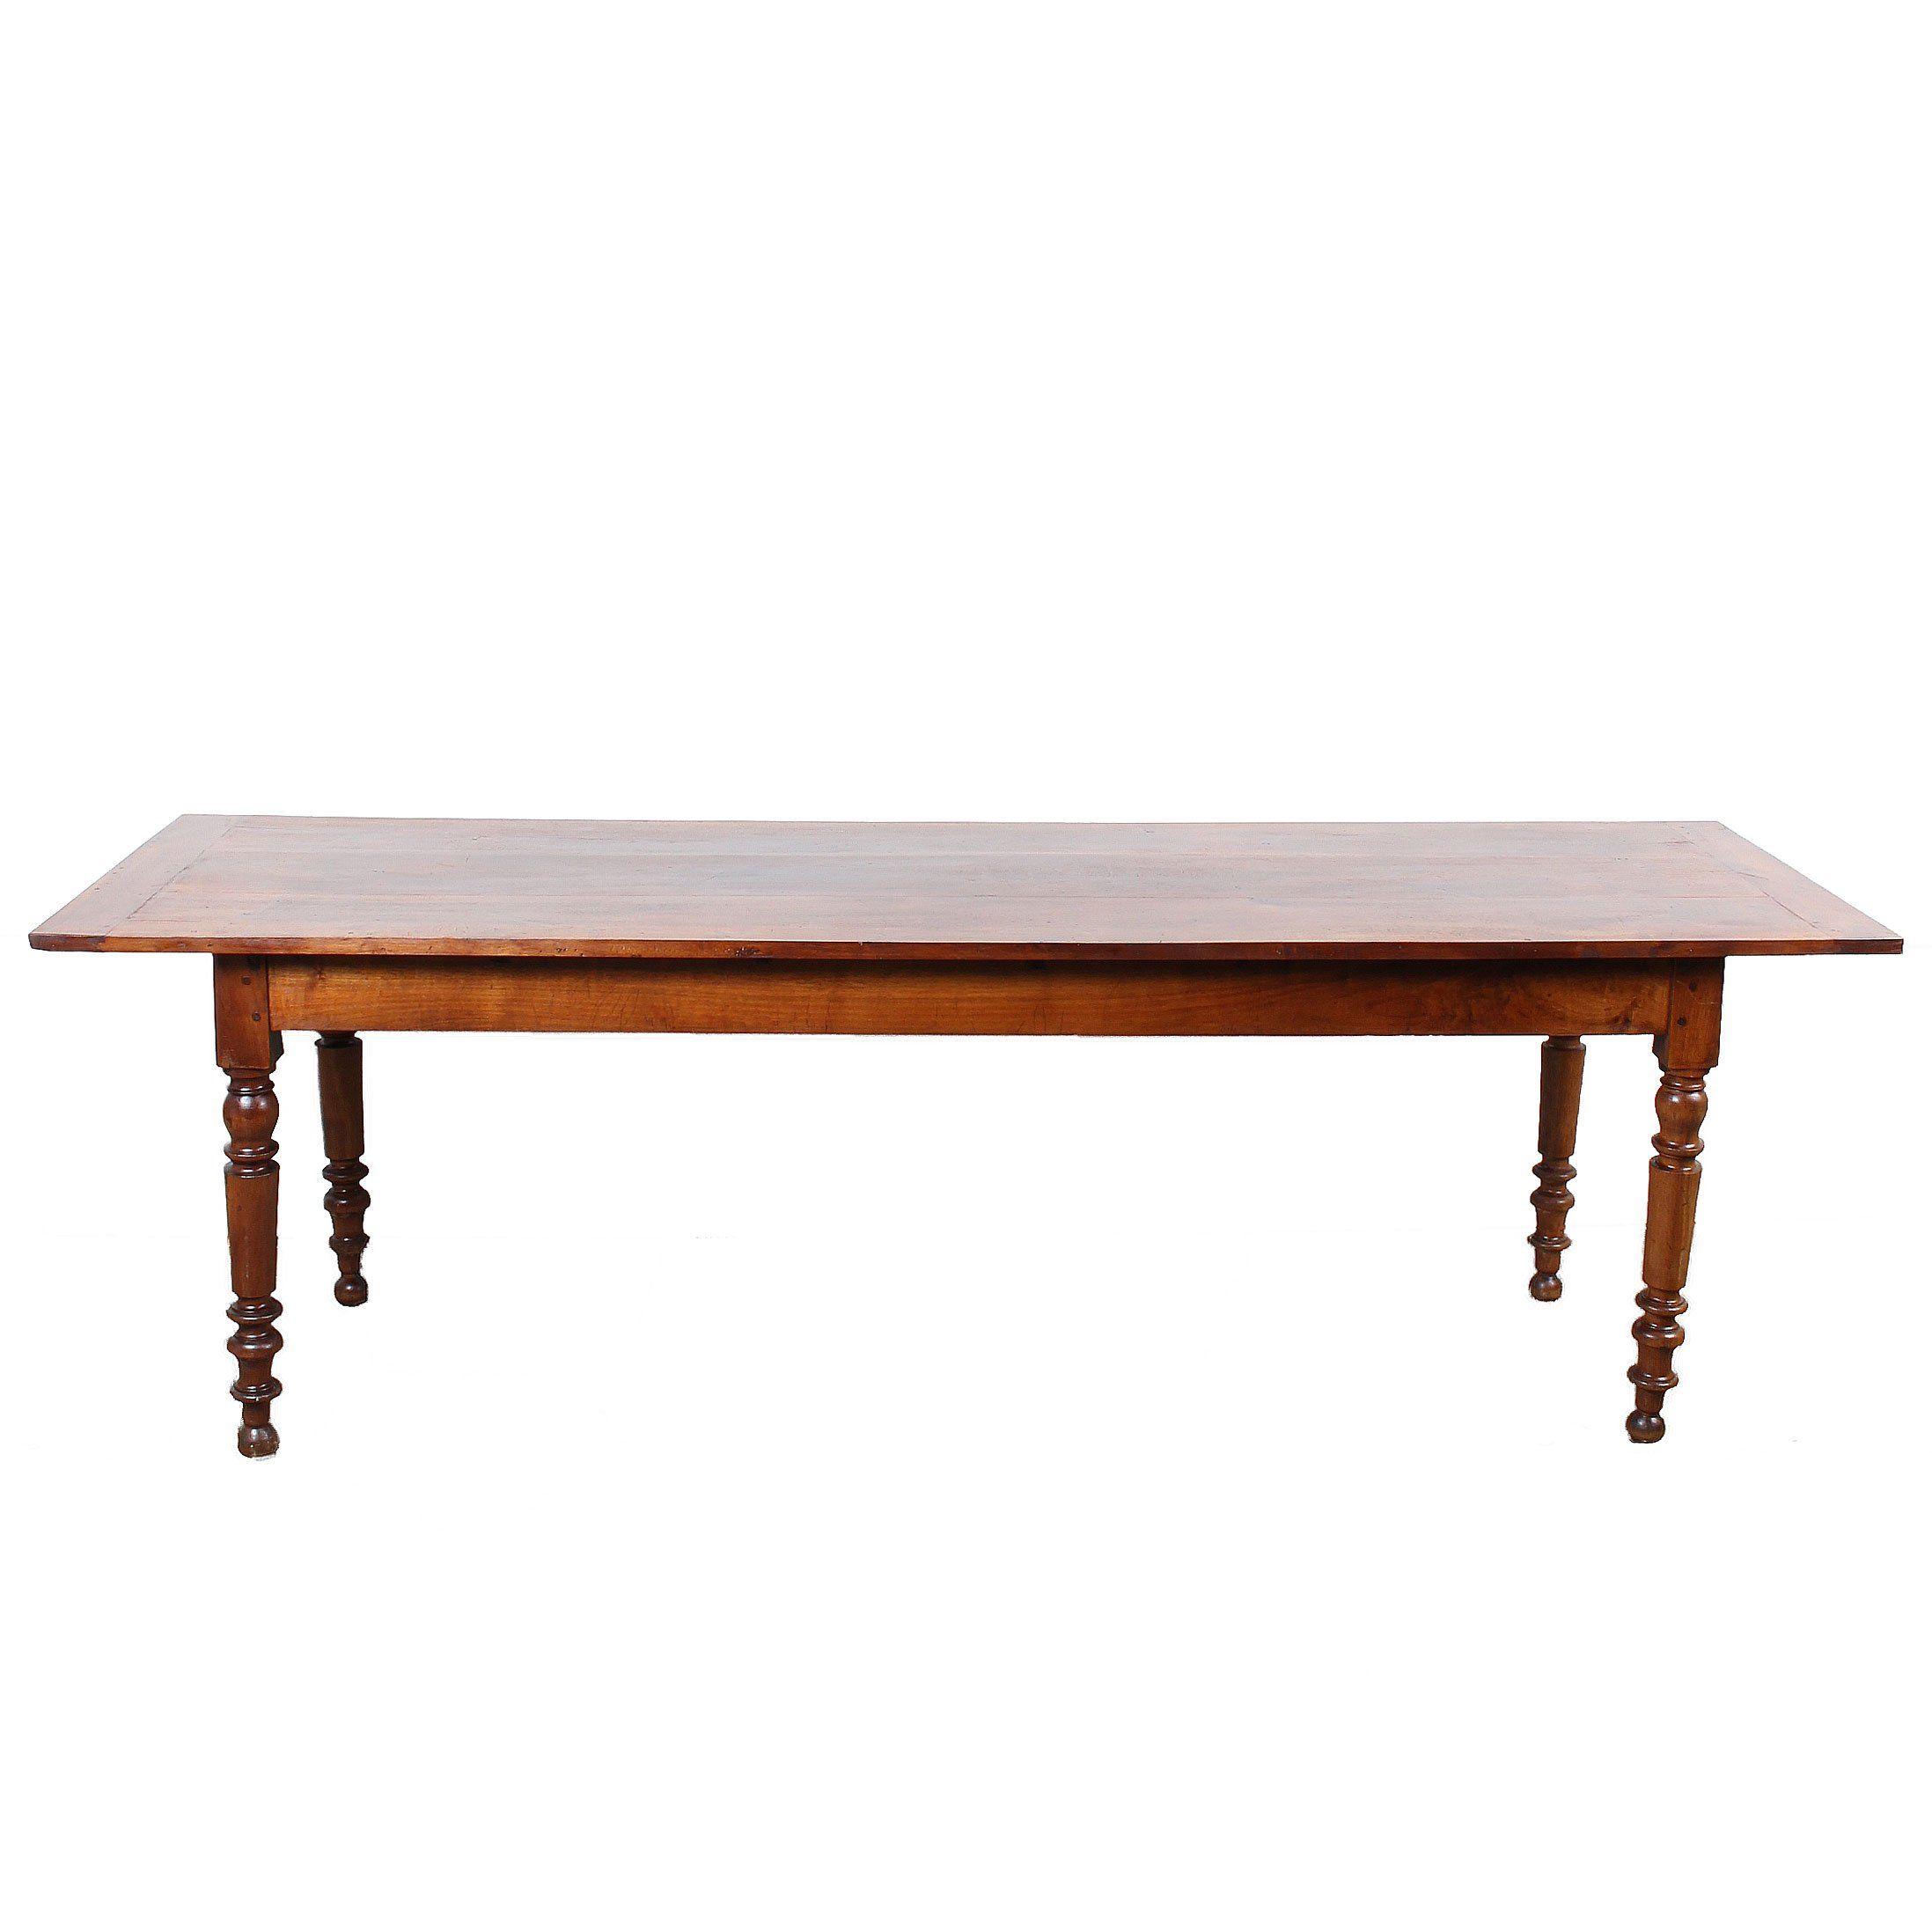 Long Narrow 19th c. French Walnut Farm Table French